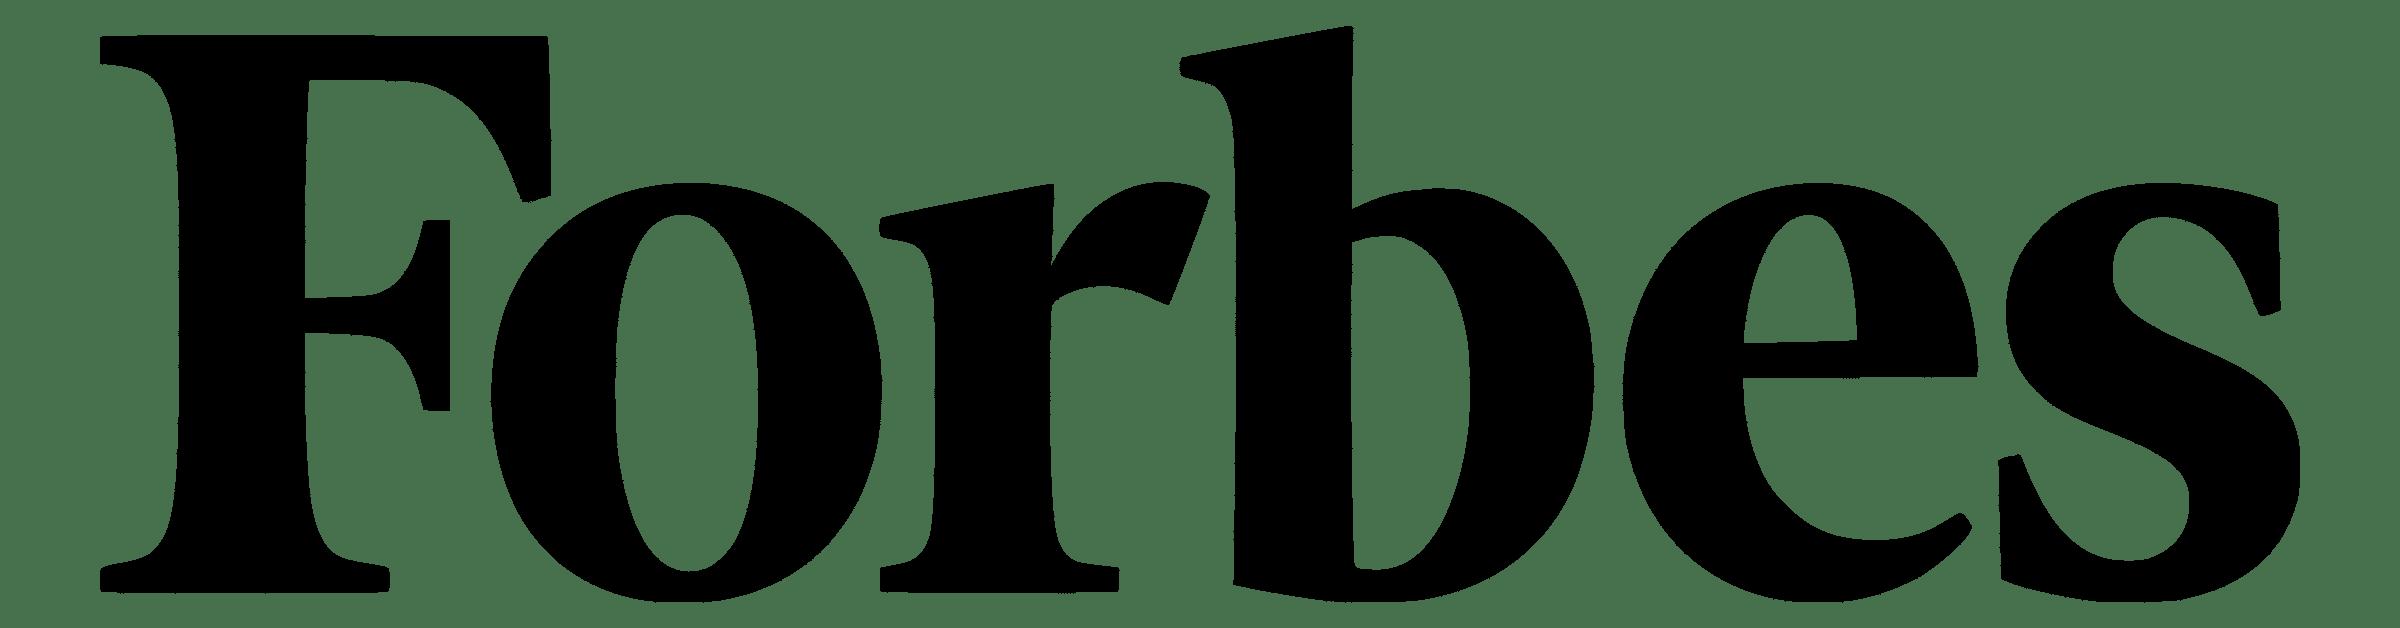 Forbes Logo PNG images Free Download - Free Transparent PNG Logos